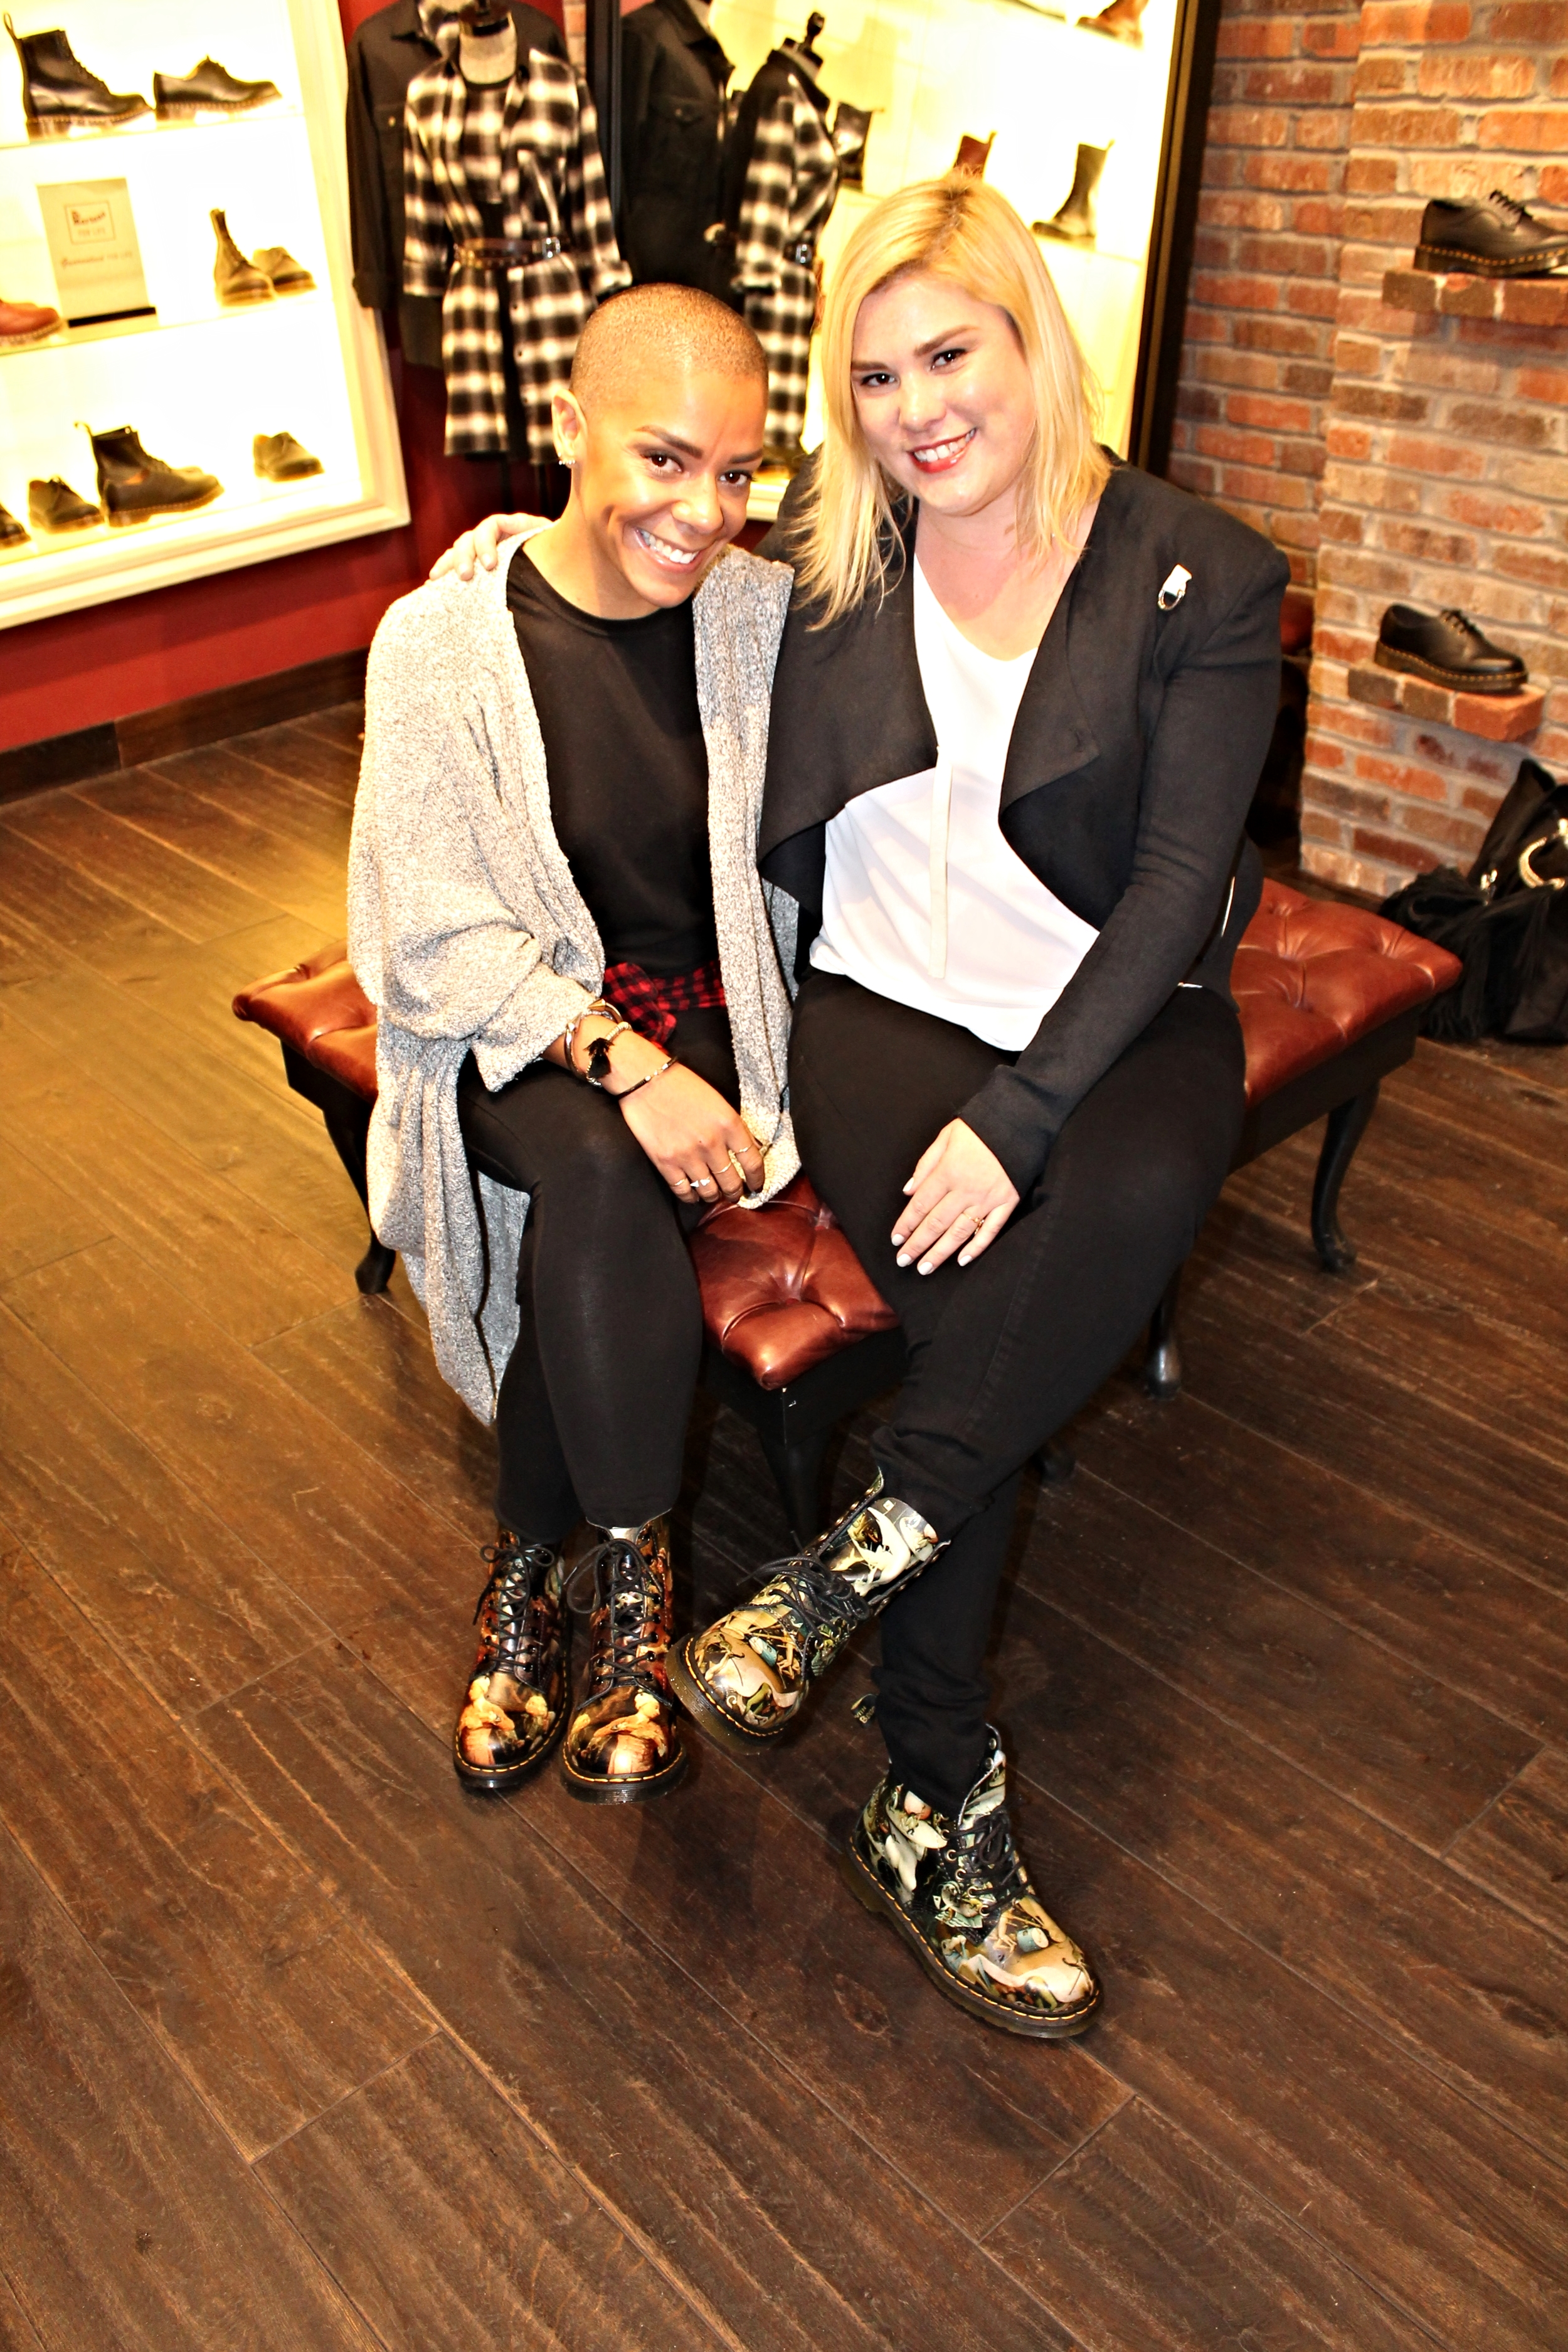 With brand ambassador Jessica Hoy